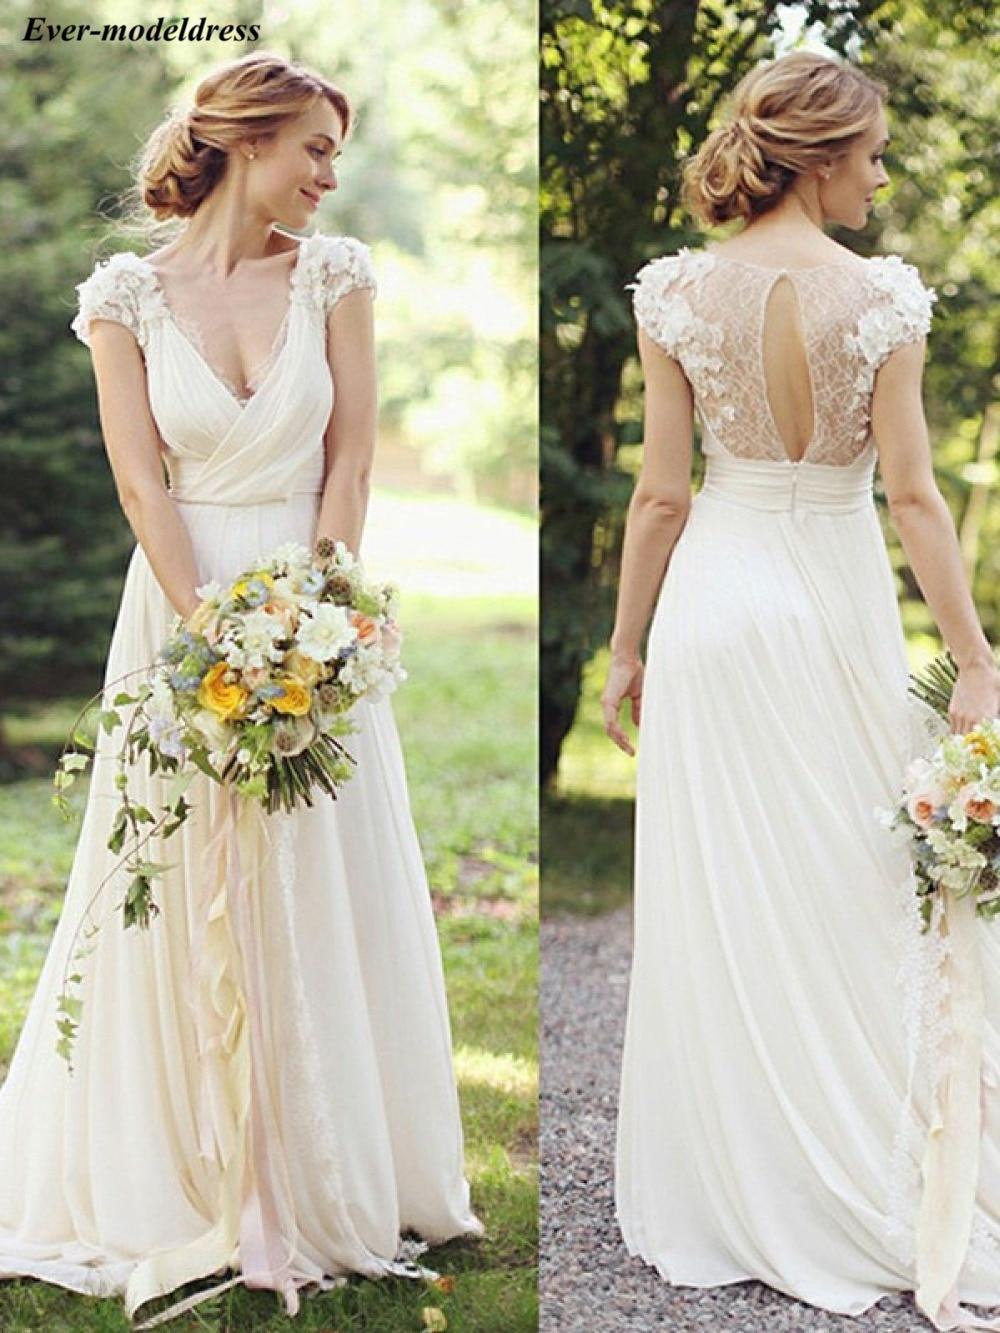 Country Wedding Dresses Boho Chiffon Lace 3D Flowers Floor Length Deep V-Neck Open Back Sexy Bridal Gowns Robe De Mariee Cheap